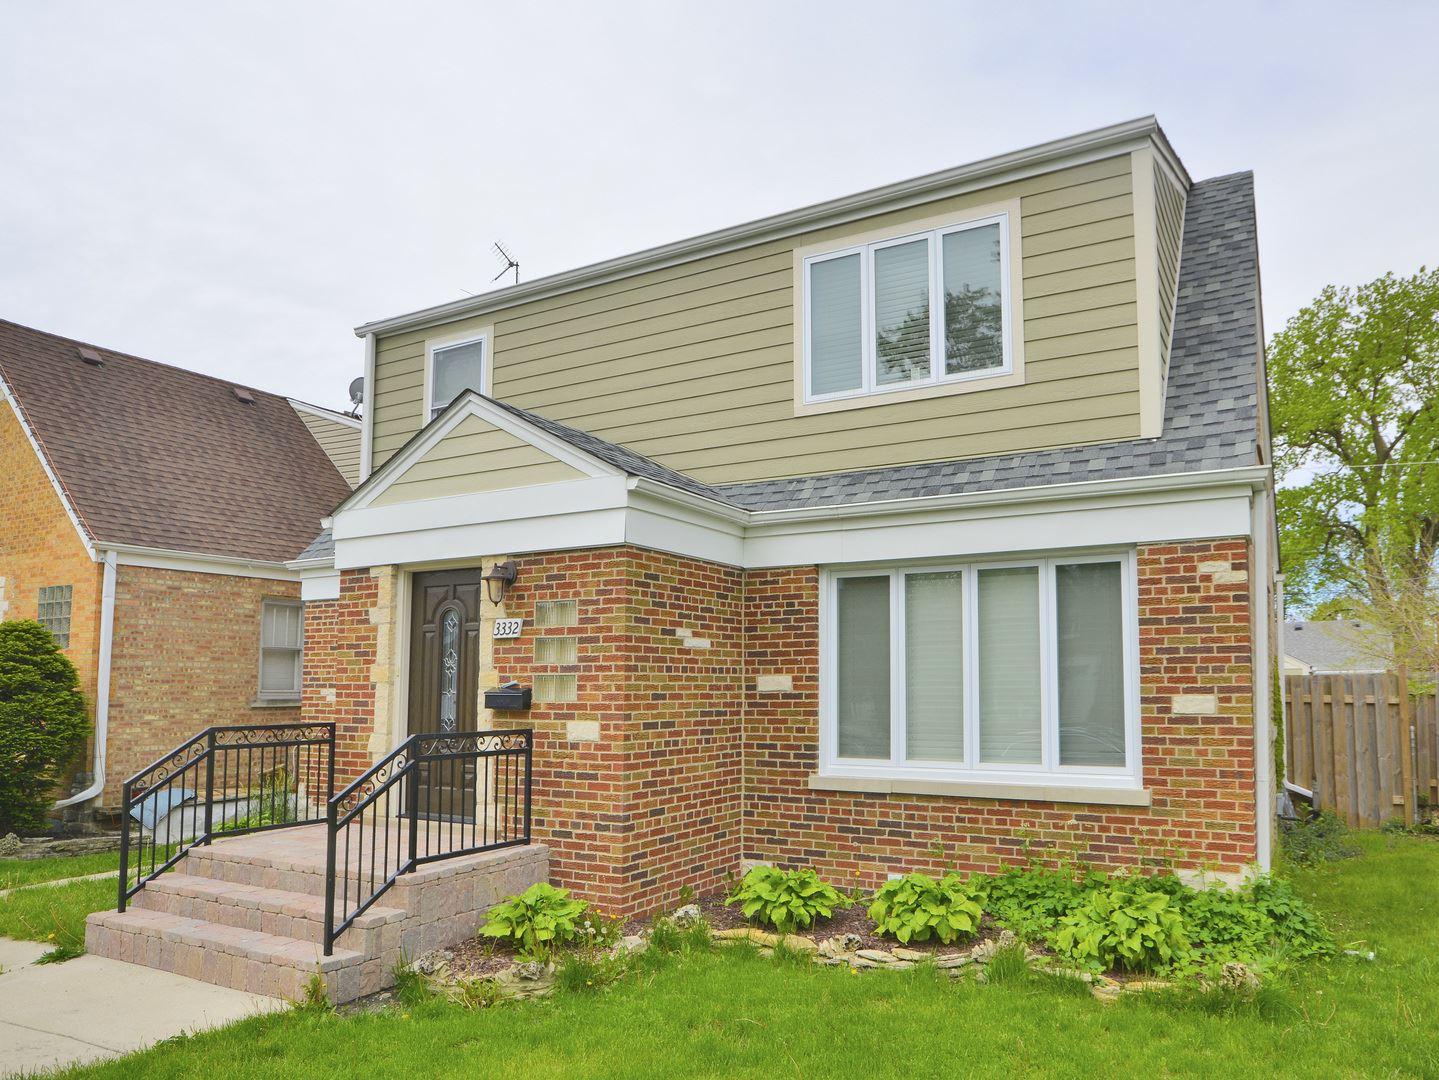 3332 N Pioneer Avenue, Chicago, IL 60634 - #: 10713074